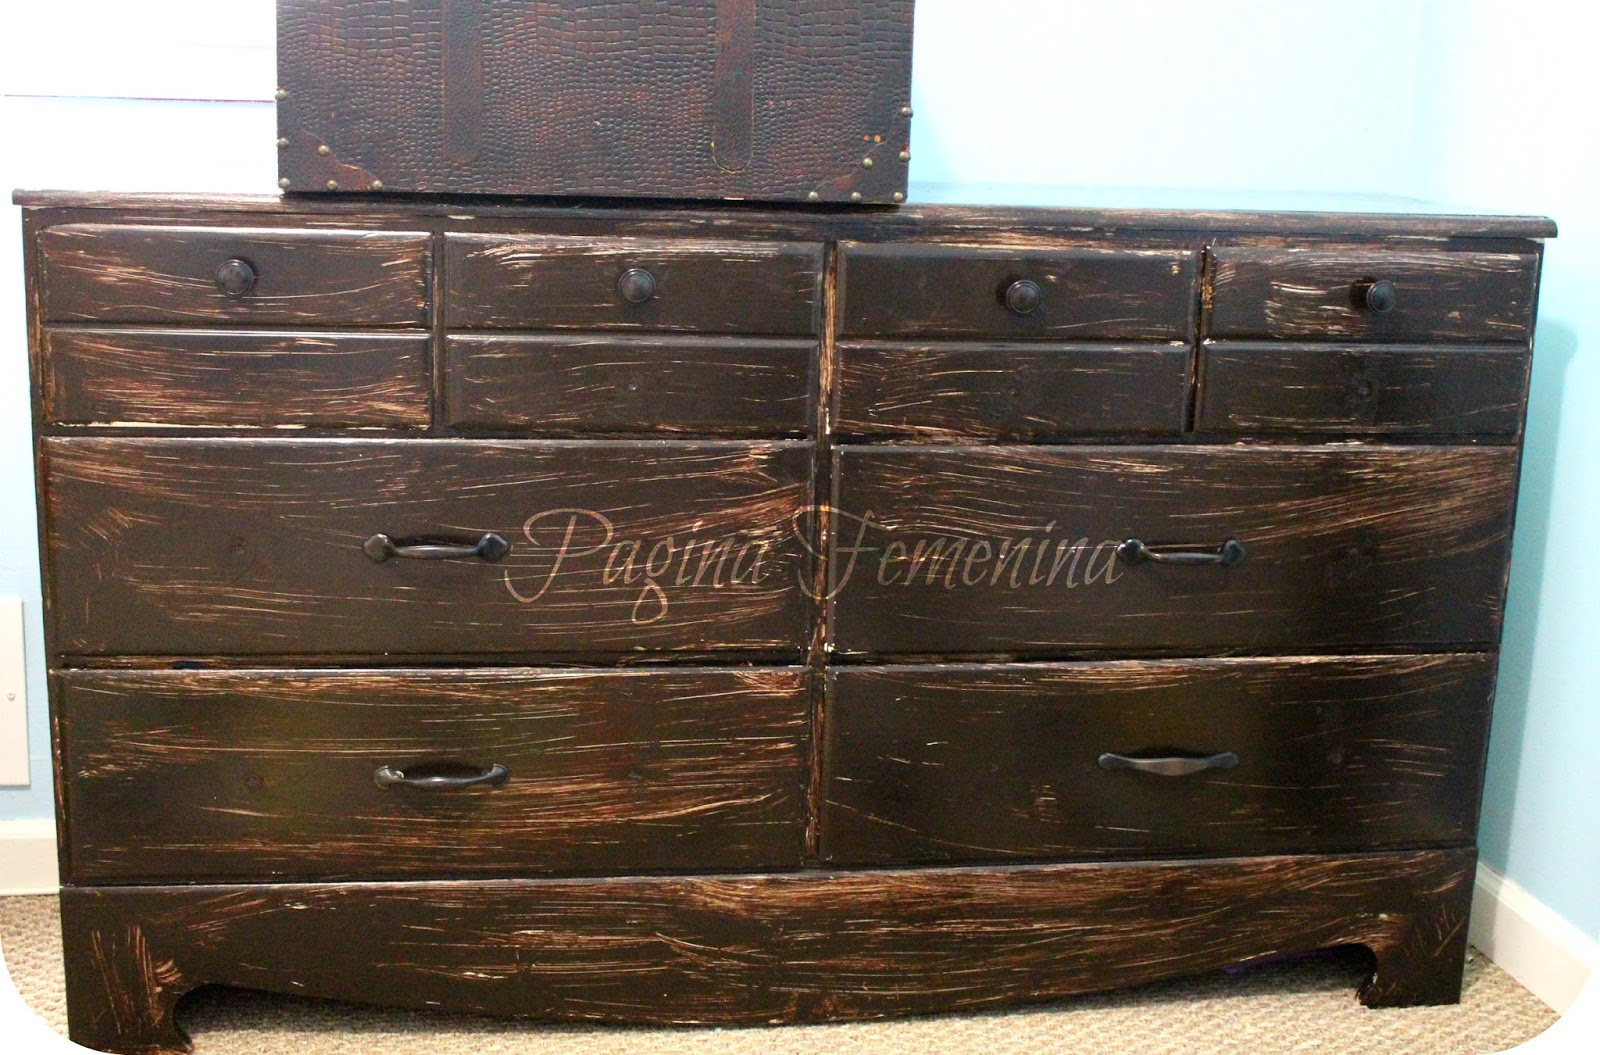 C mo renovar los muebles viejos super f cil p gina femenina for Renovar muebles antiguos